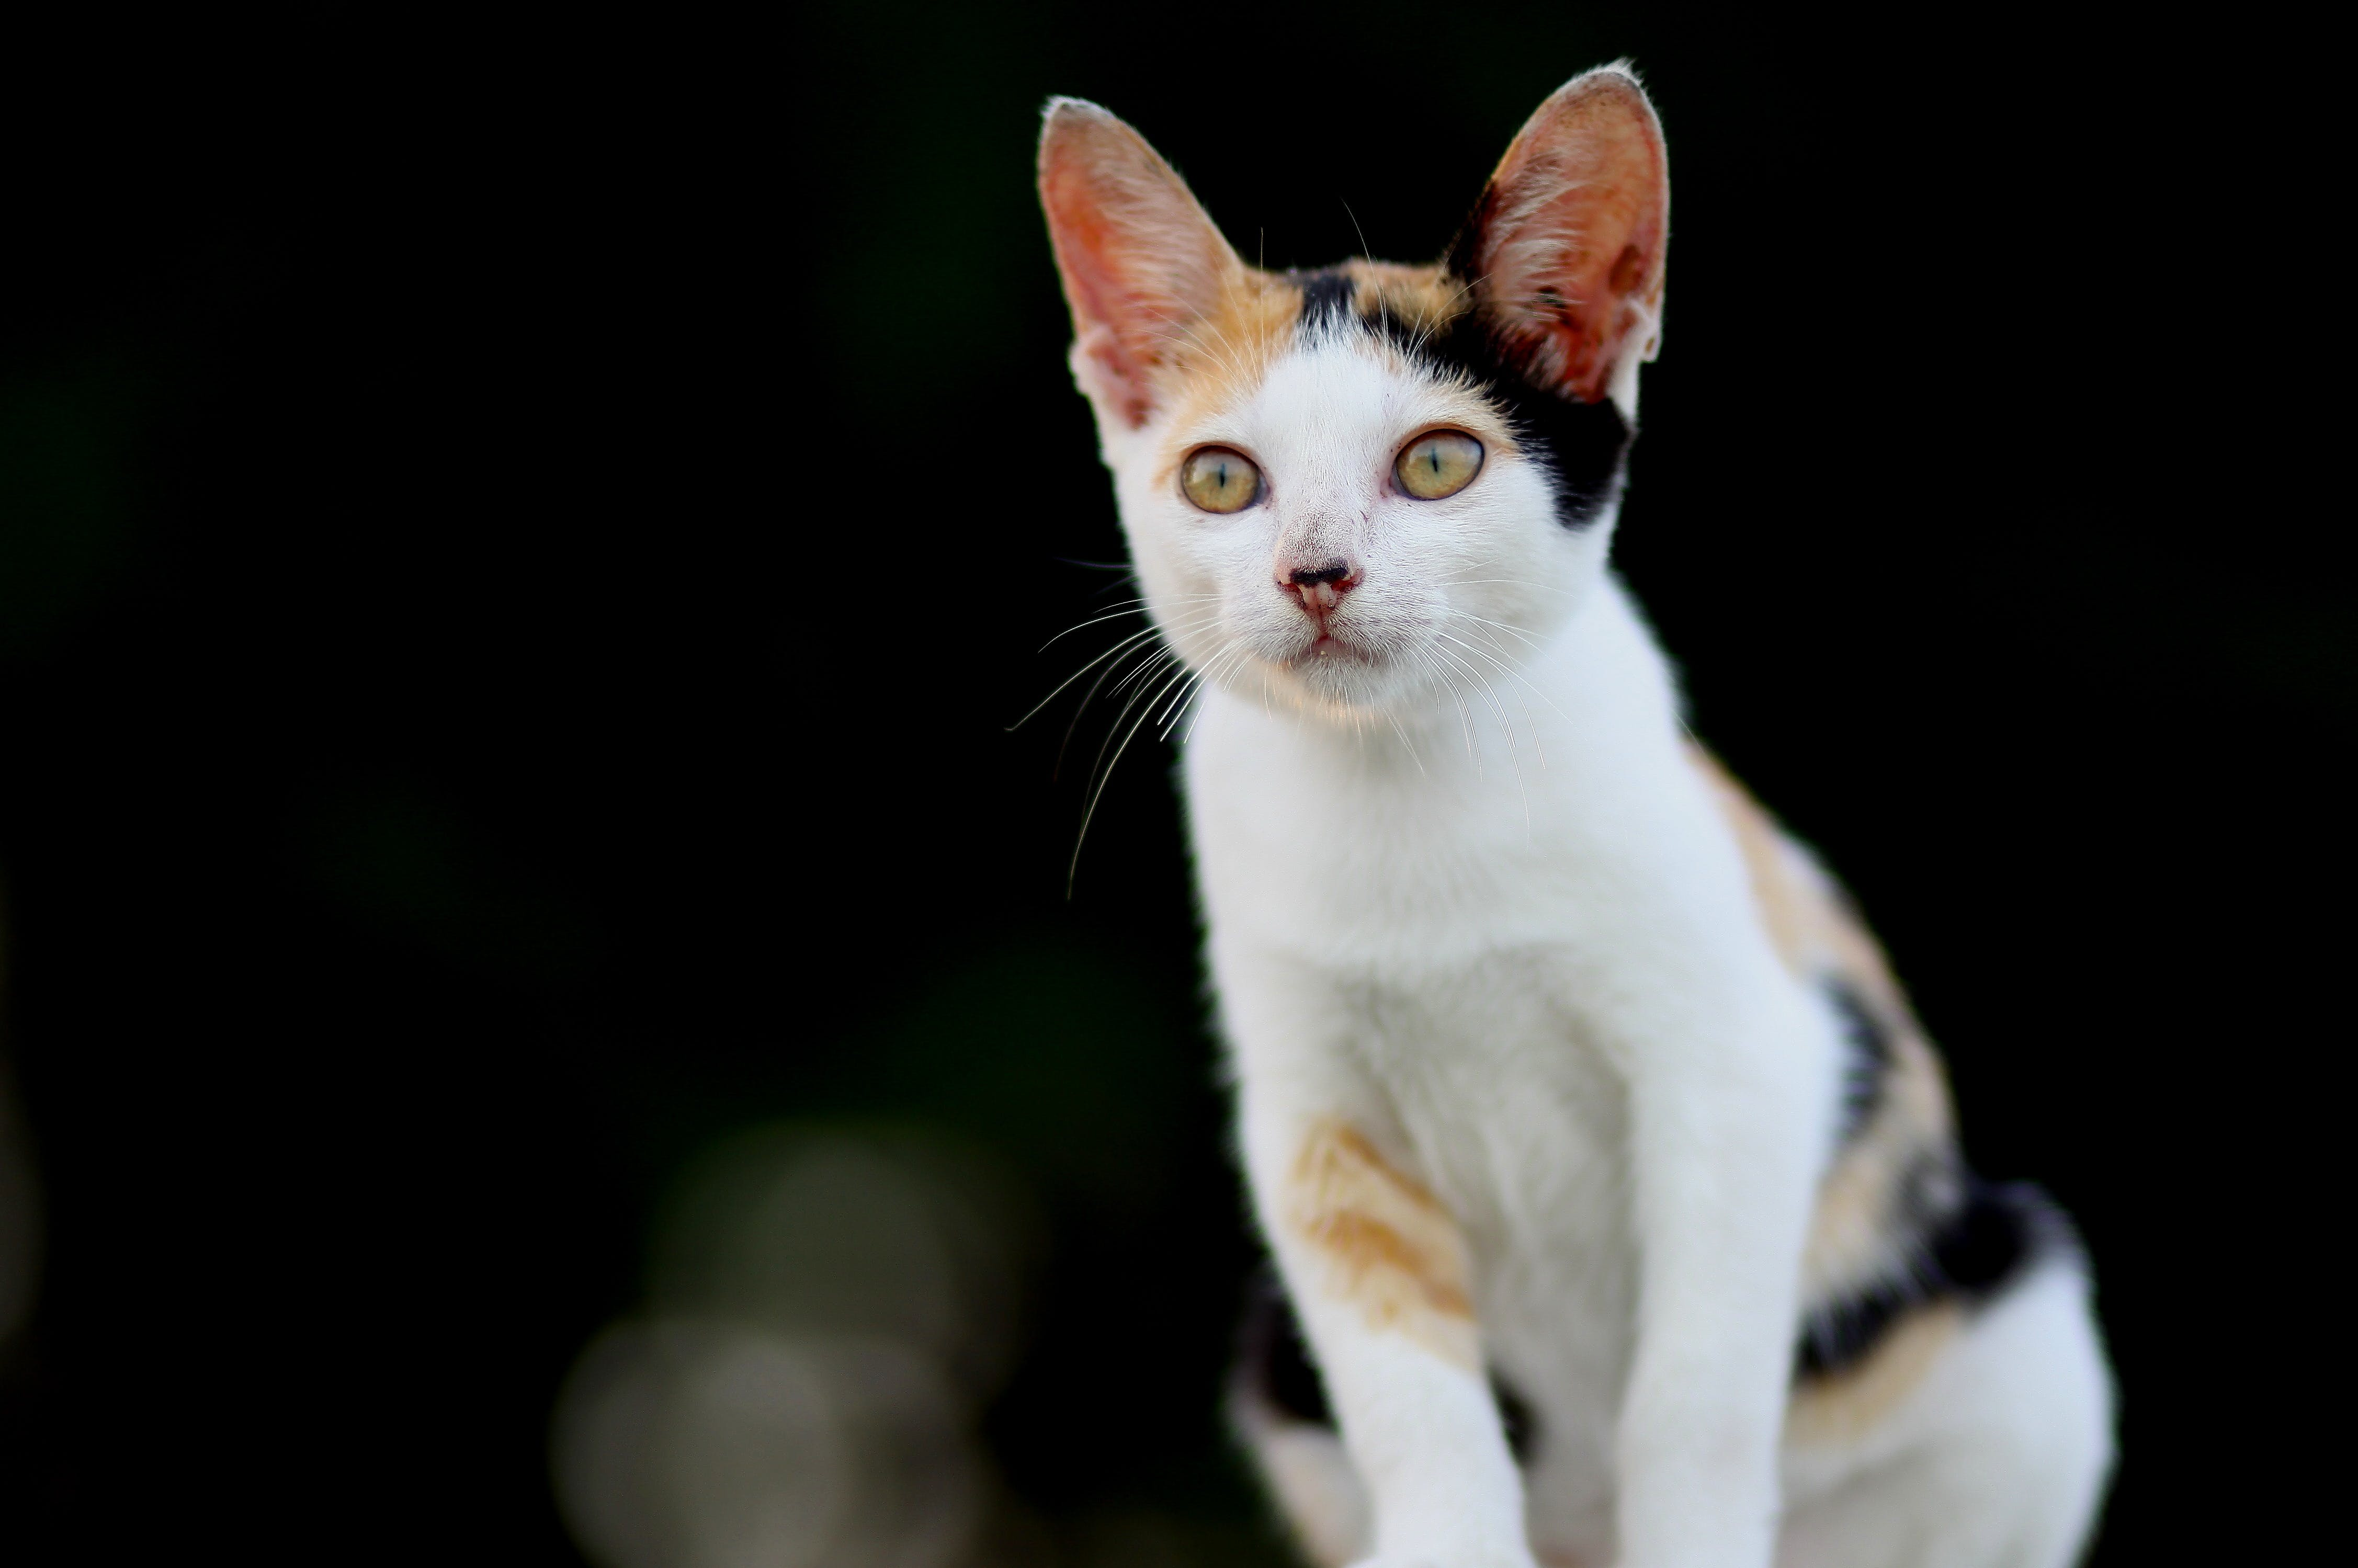 animal, cat, close-up